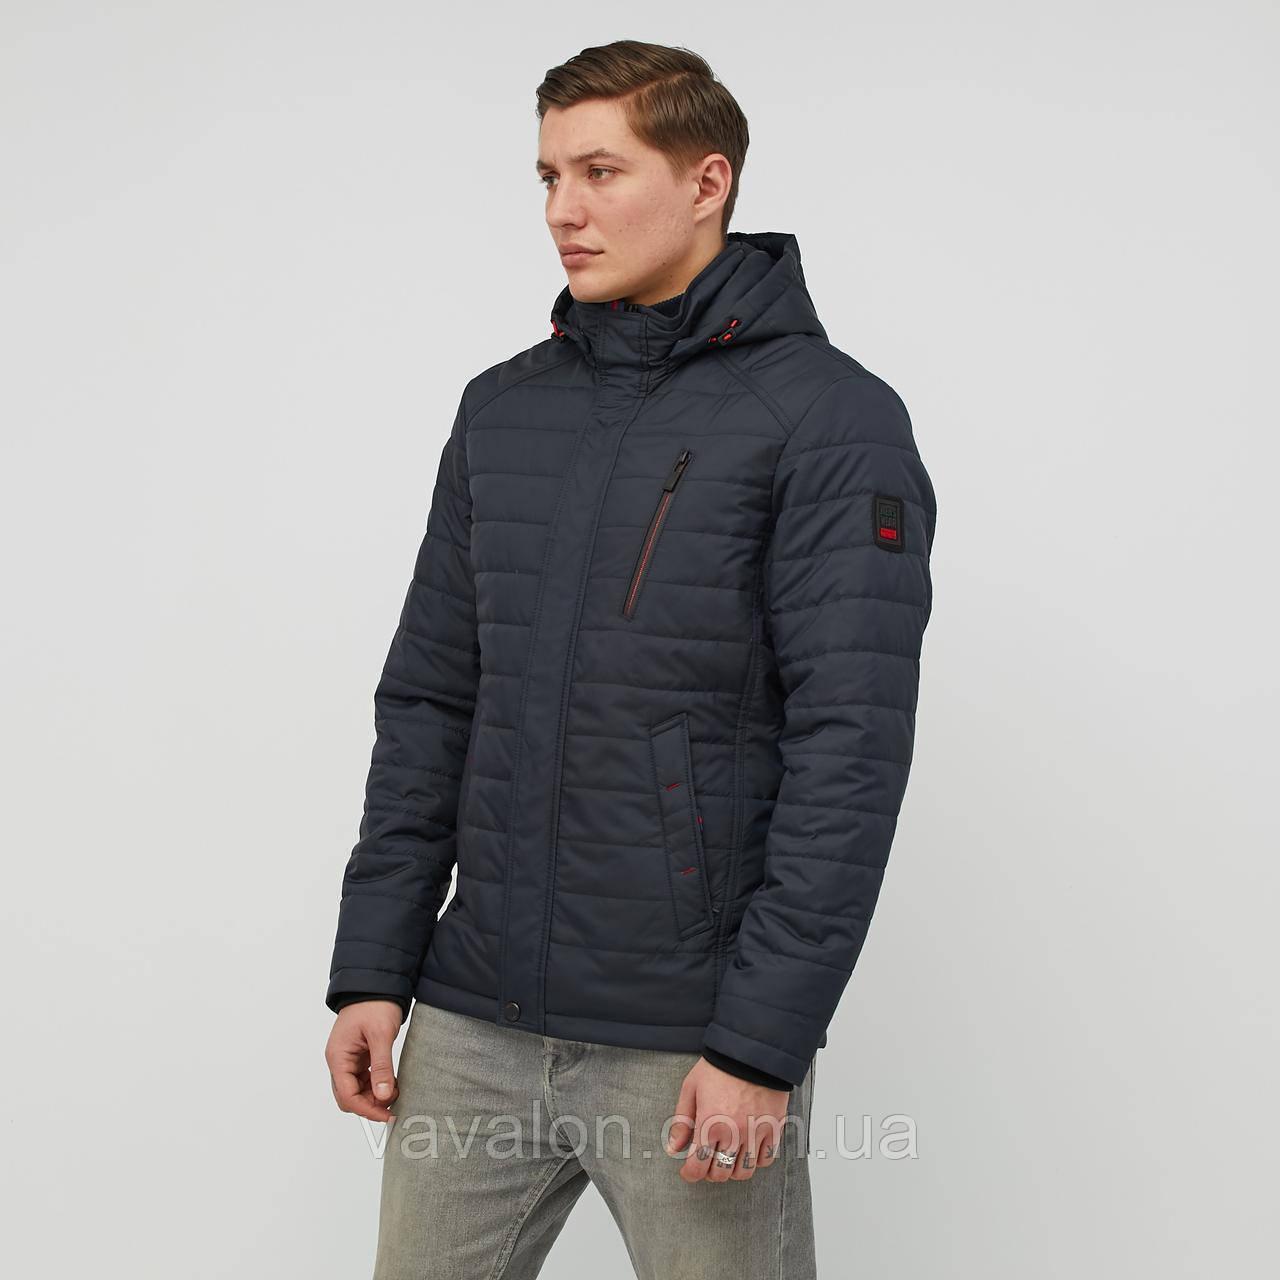 Куртка демисезонная Vavalon KD-194 navy